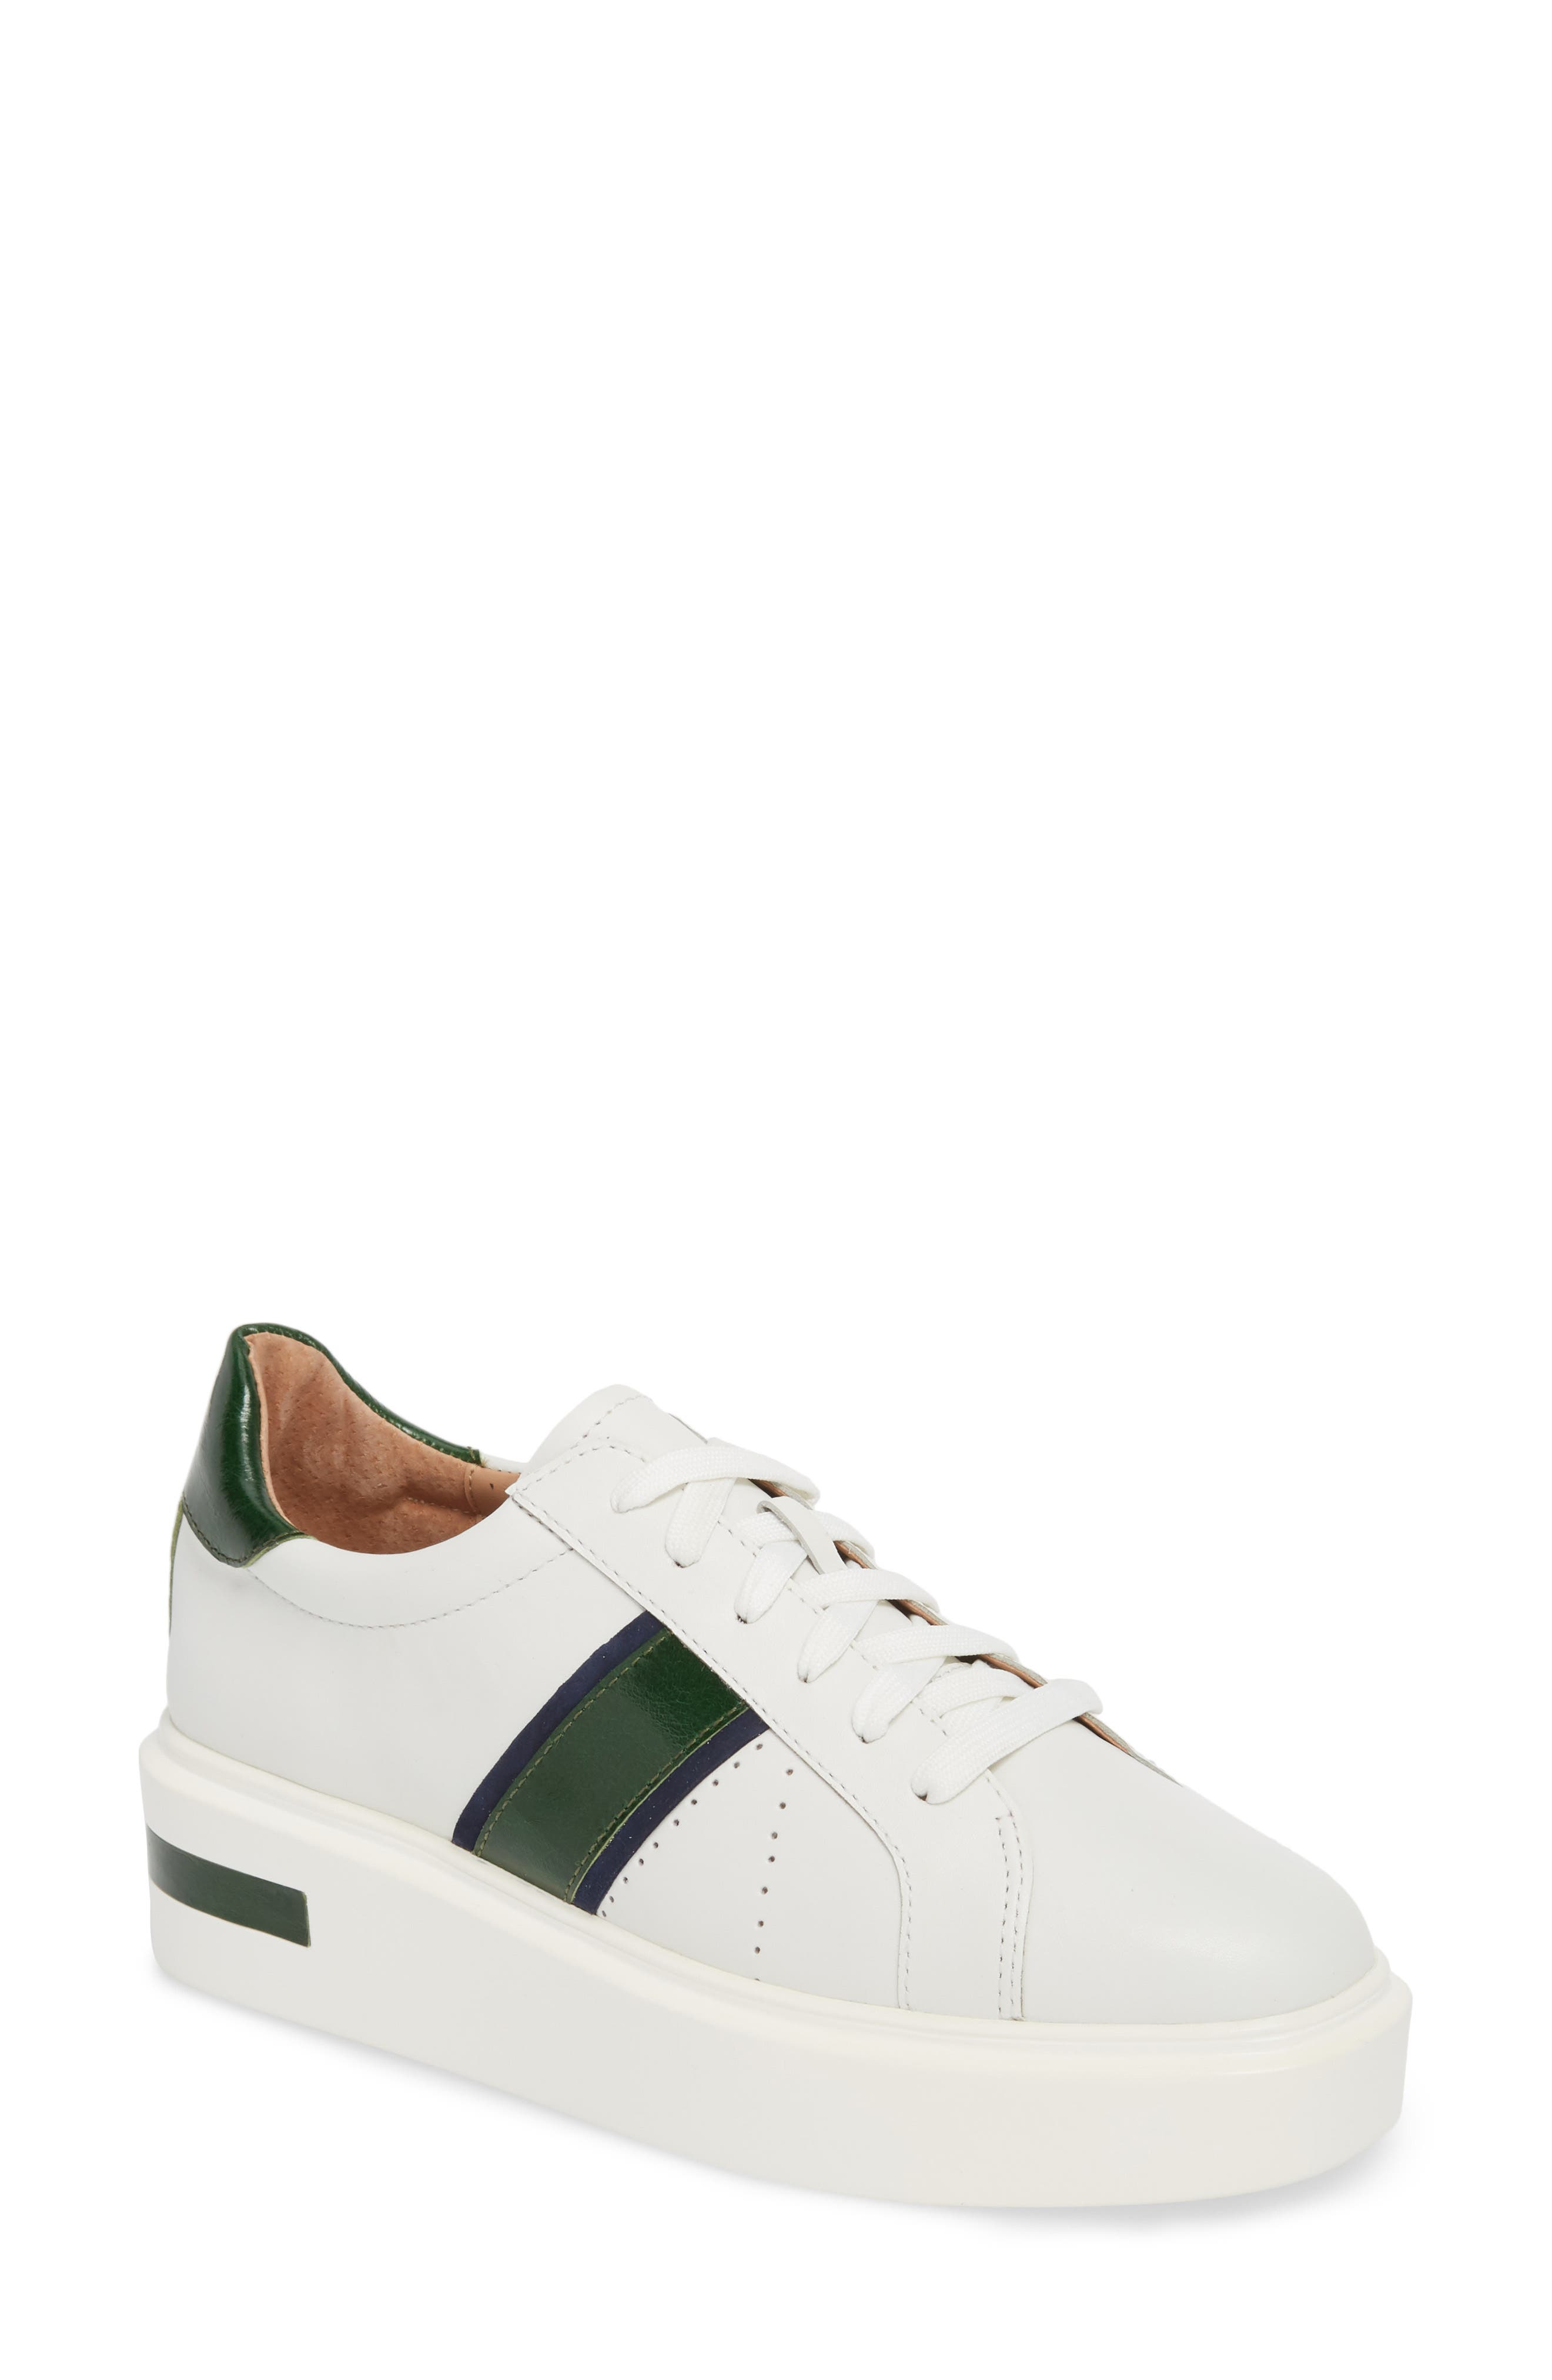 LINEA PAOLO, Knox Platform Sneaker, Main thumbnail 1, color, WHITE LEATHER